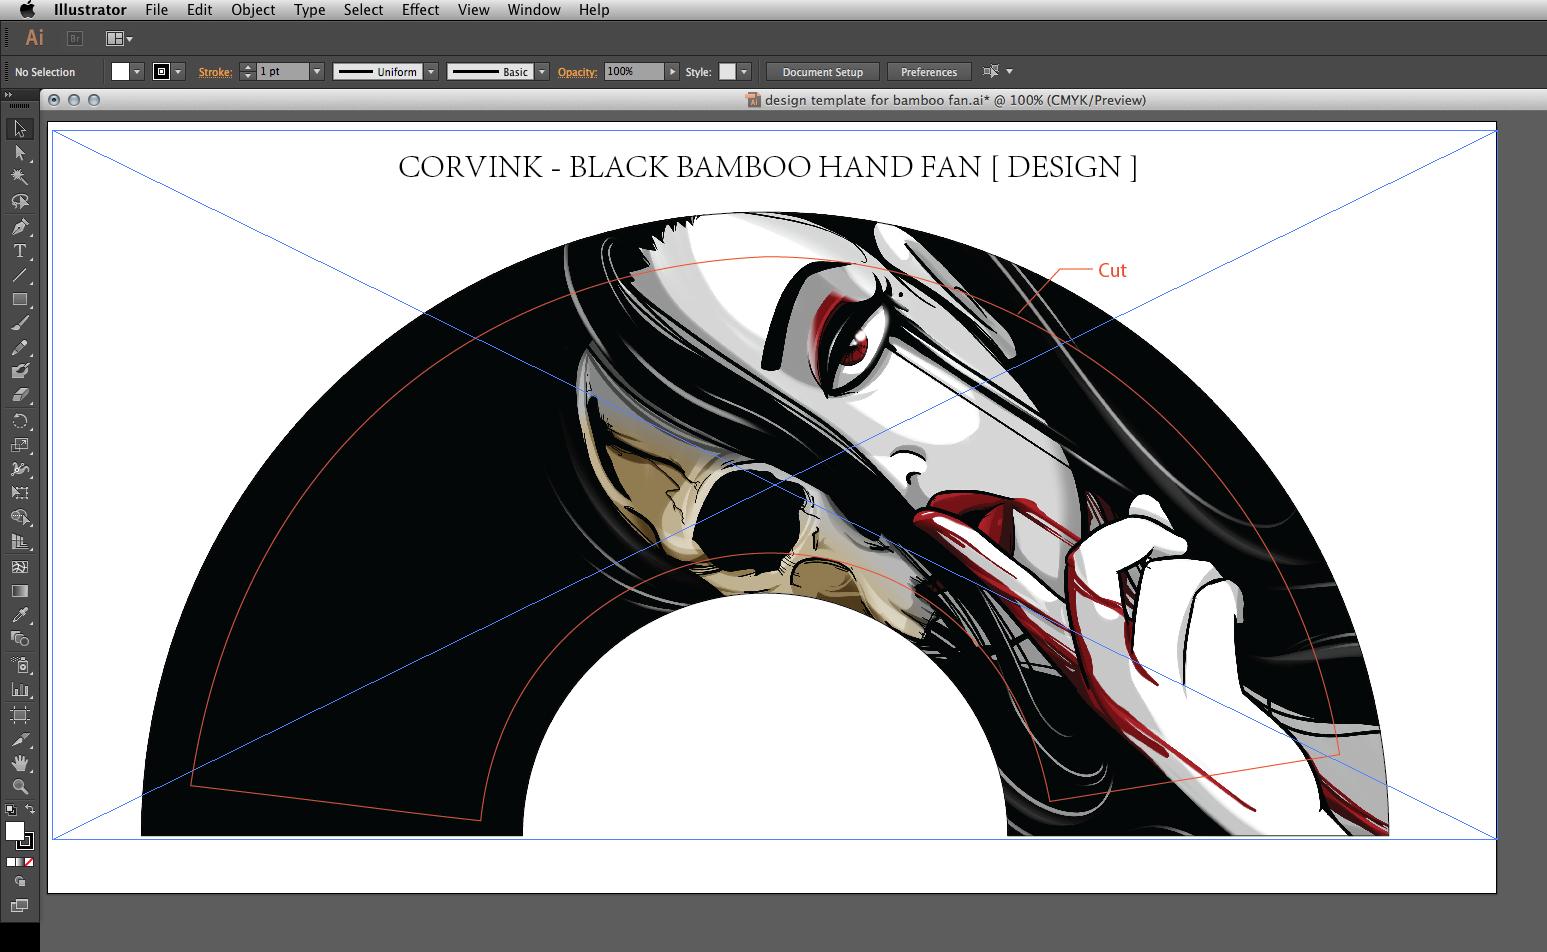 """Death"" Hand Fan Design Mock-Up in Adobe Illustrator [ 17.4"" x 8.7 ]"